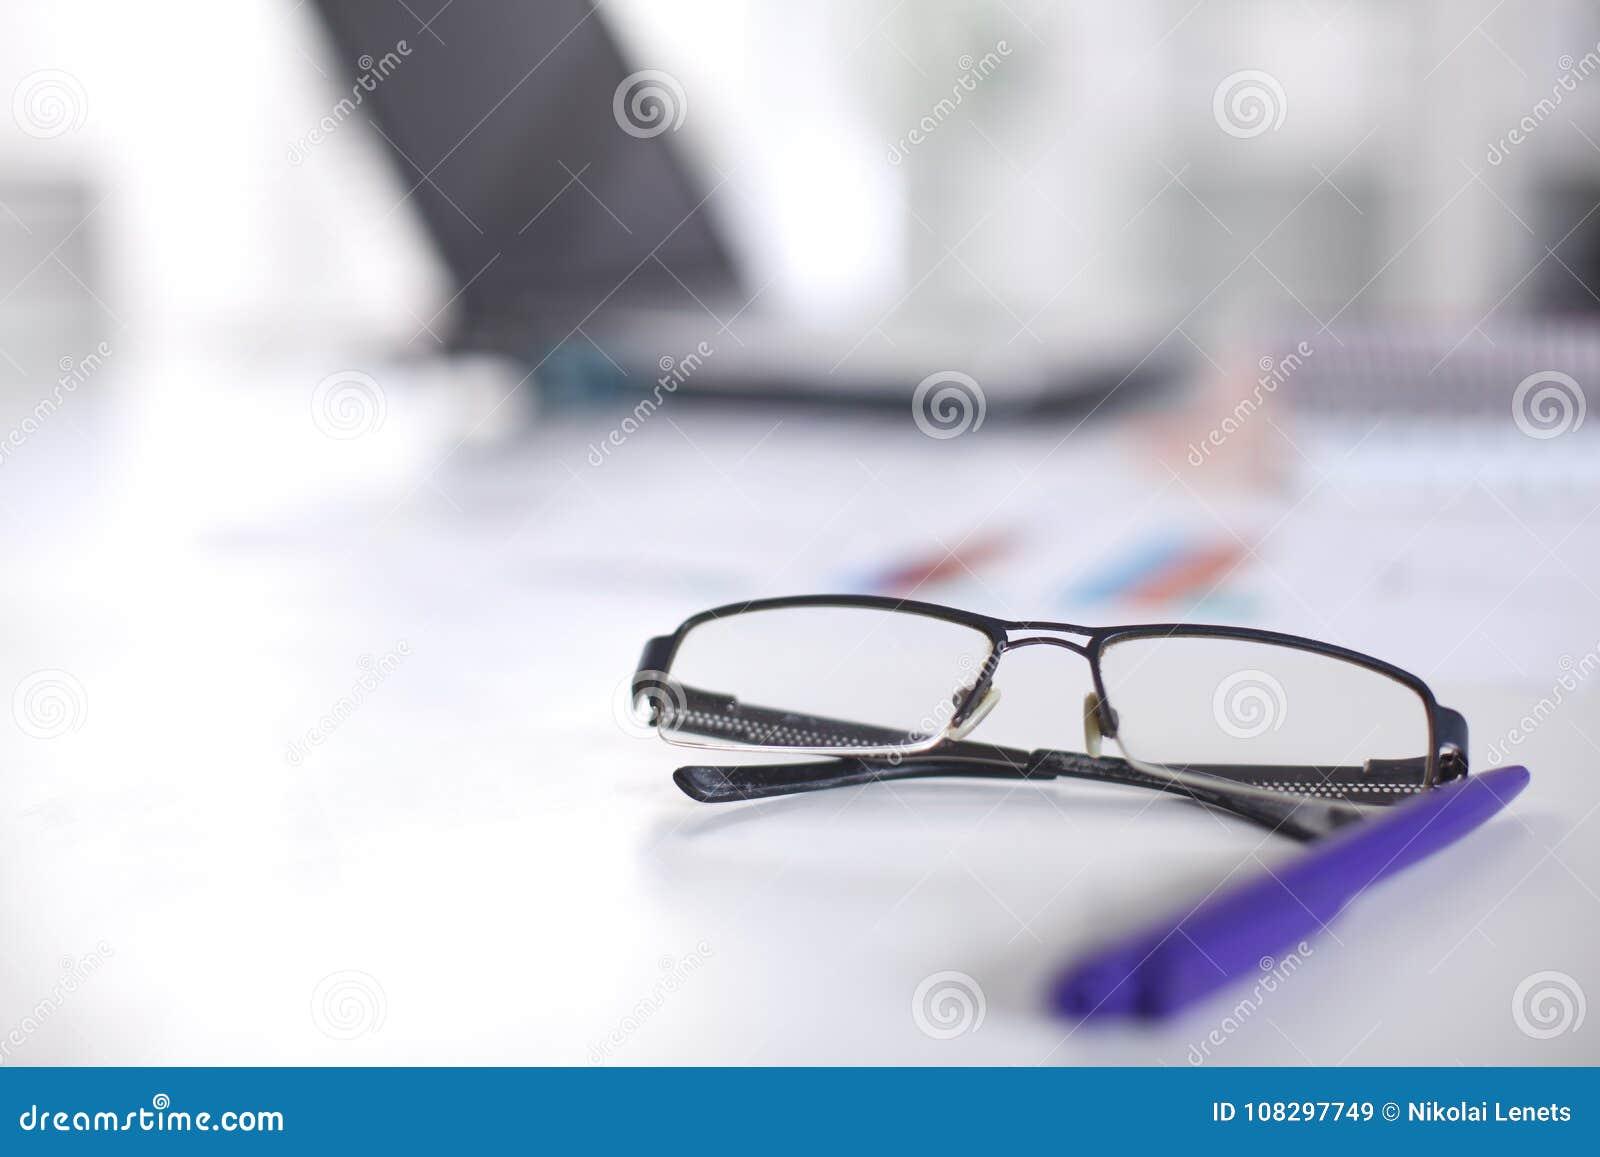 84d3191d3a Γυαλιά στον υπολογιστή γραφείου σας εργασία με τα σχέδια περιοδεύστε τα  επιχειρησιακά κινούμενα σχέδια λεπτομερή αισθάνεται